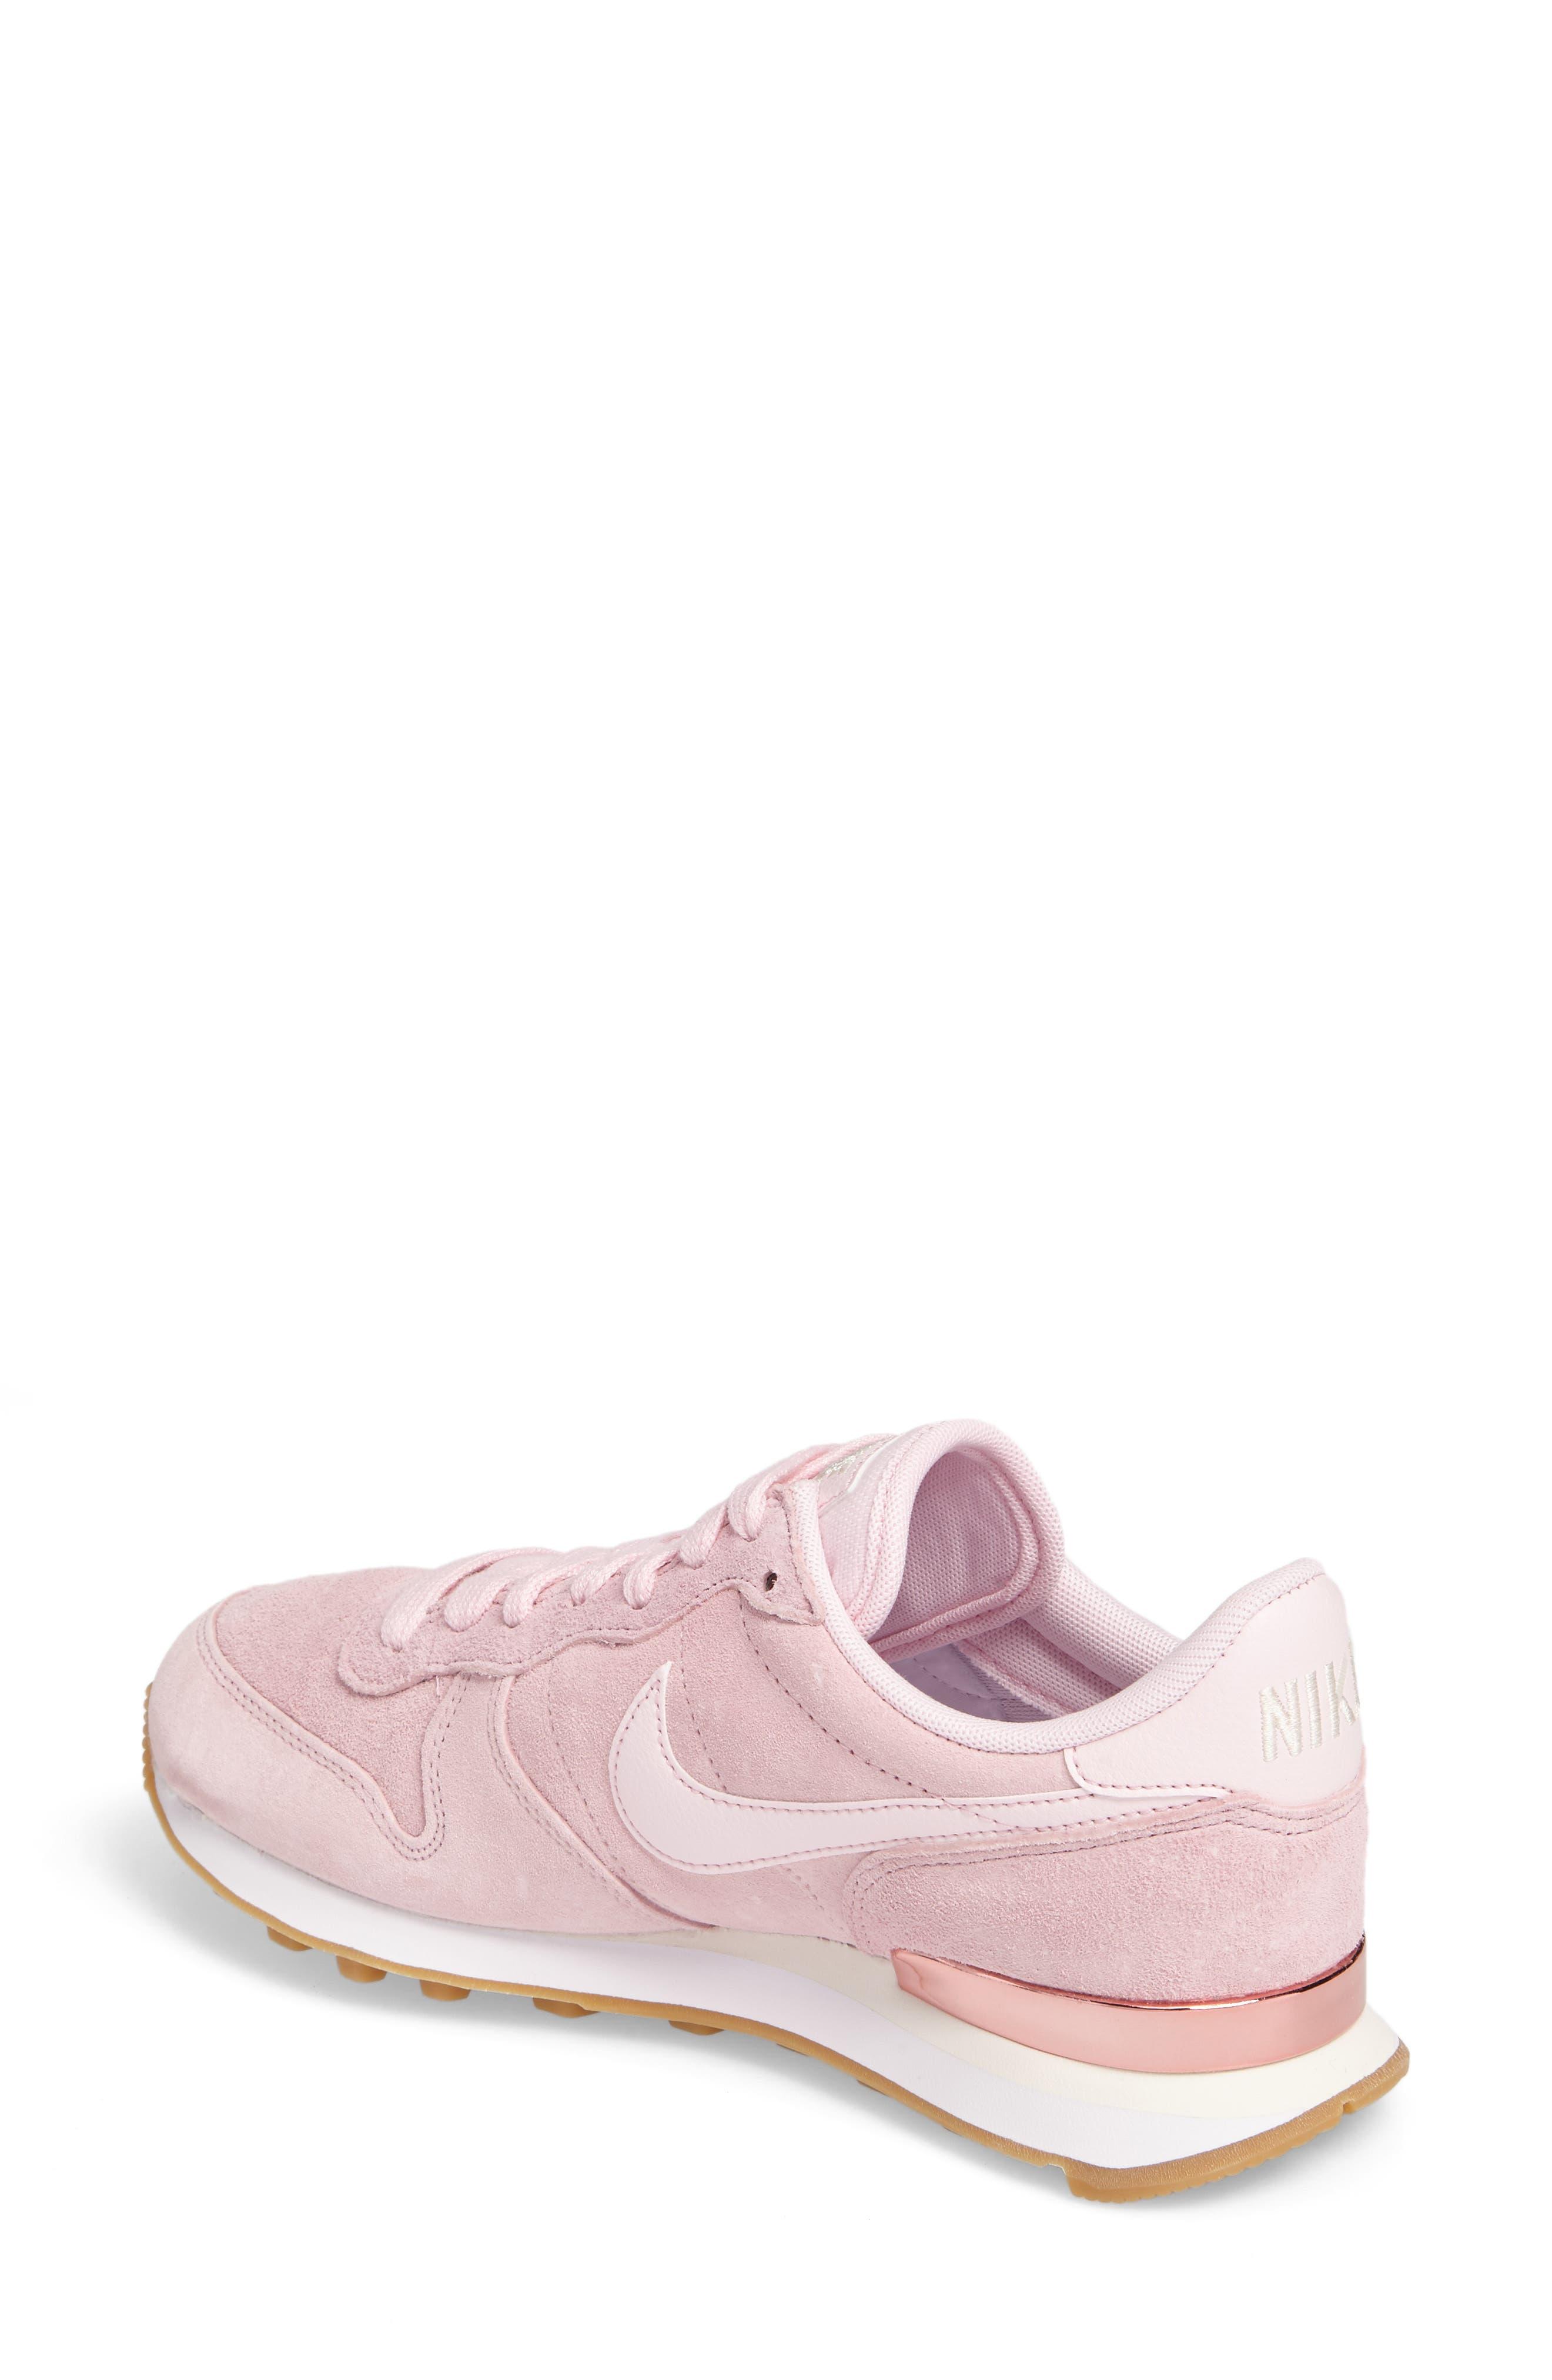 Internationalist SD Sneaker,                             Alternate thumbnail 2, color,                             Prism Pink/ Prism Pink